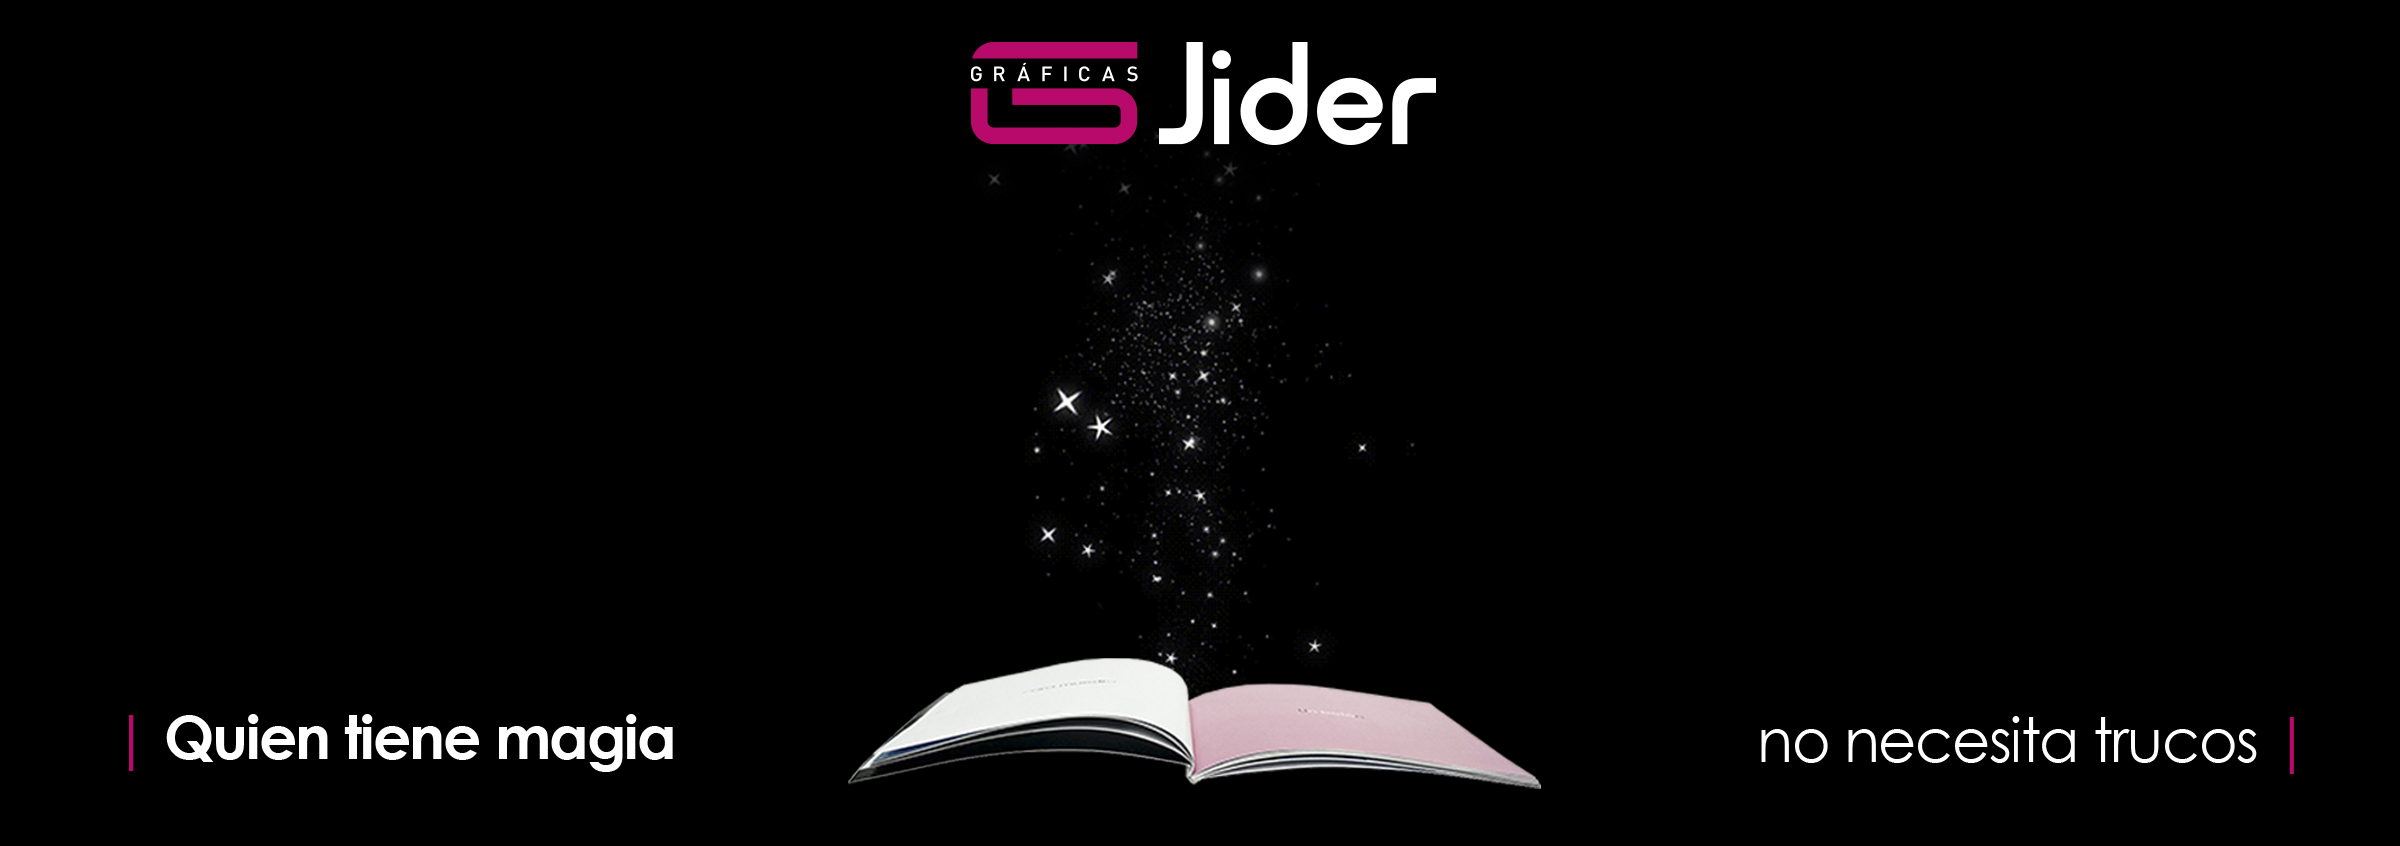 slider-graficas-jider-1